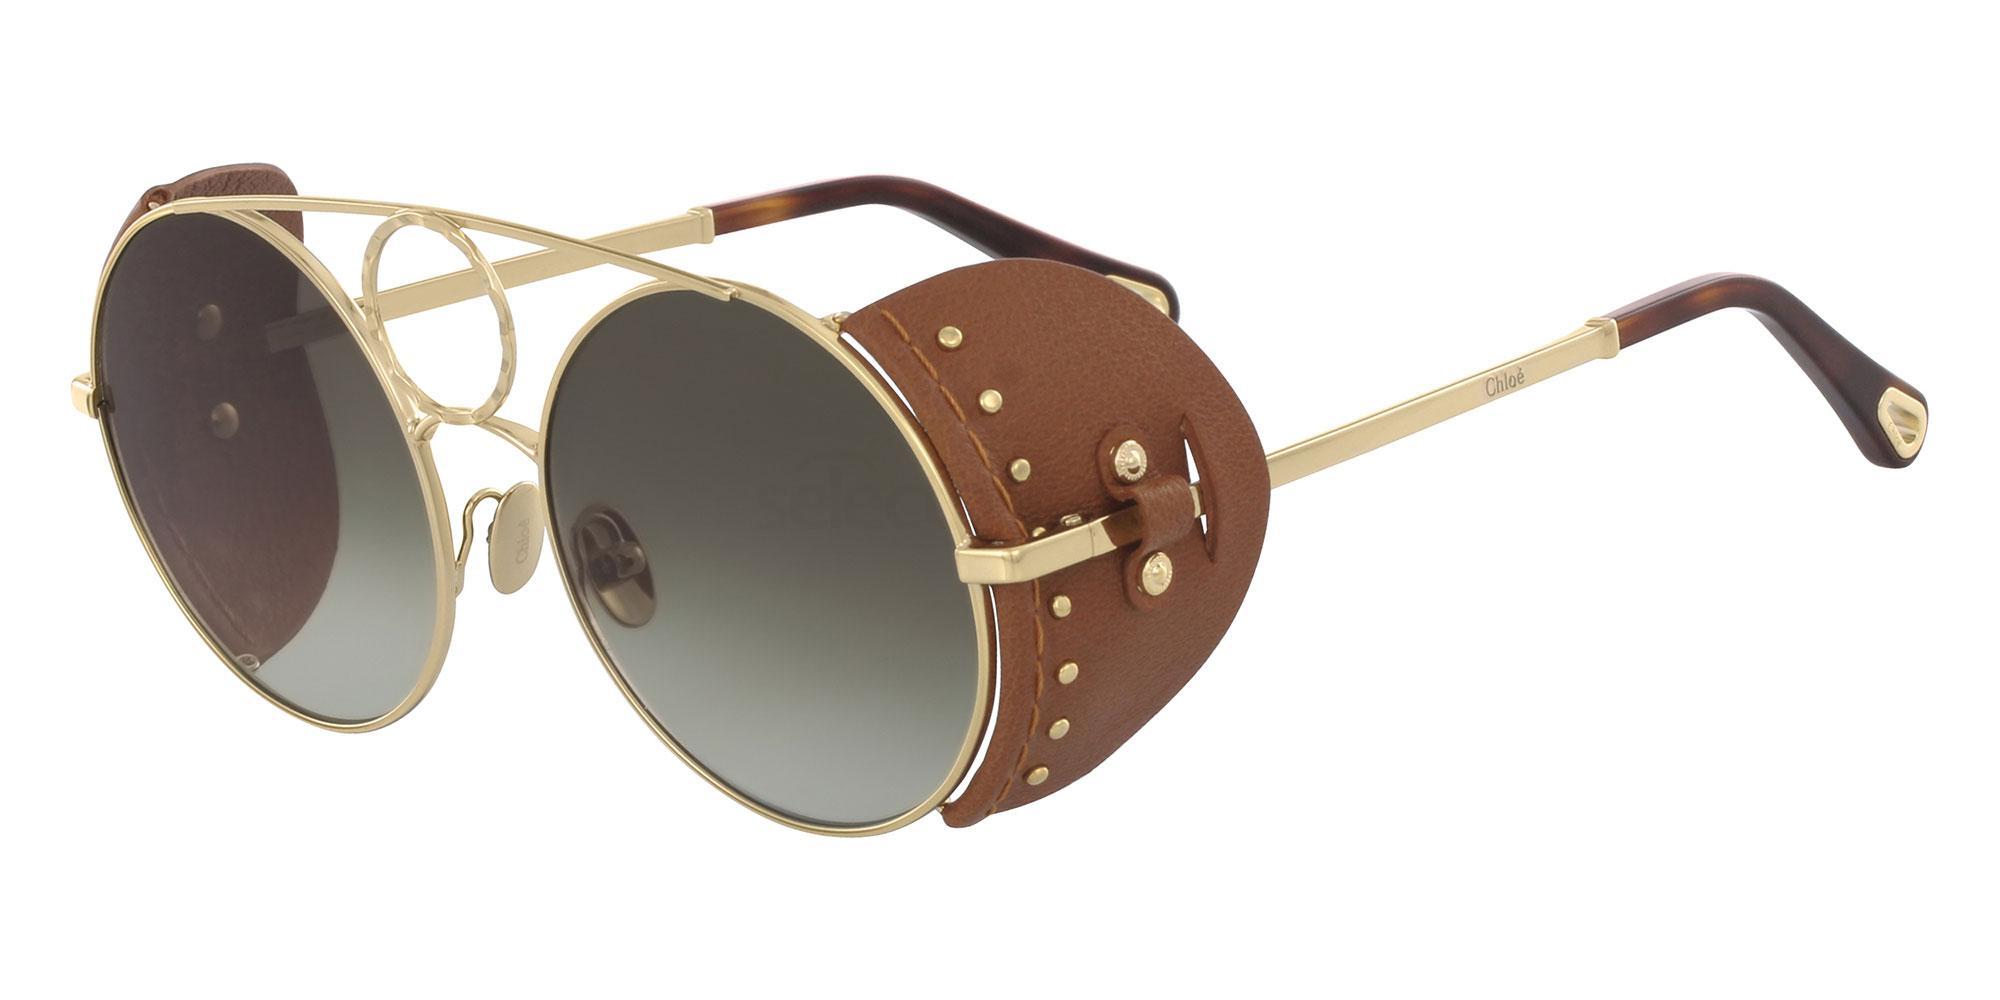 gold sunglasses trend 2019